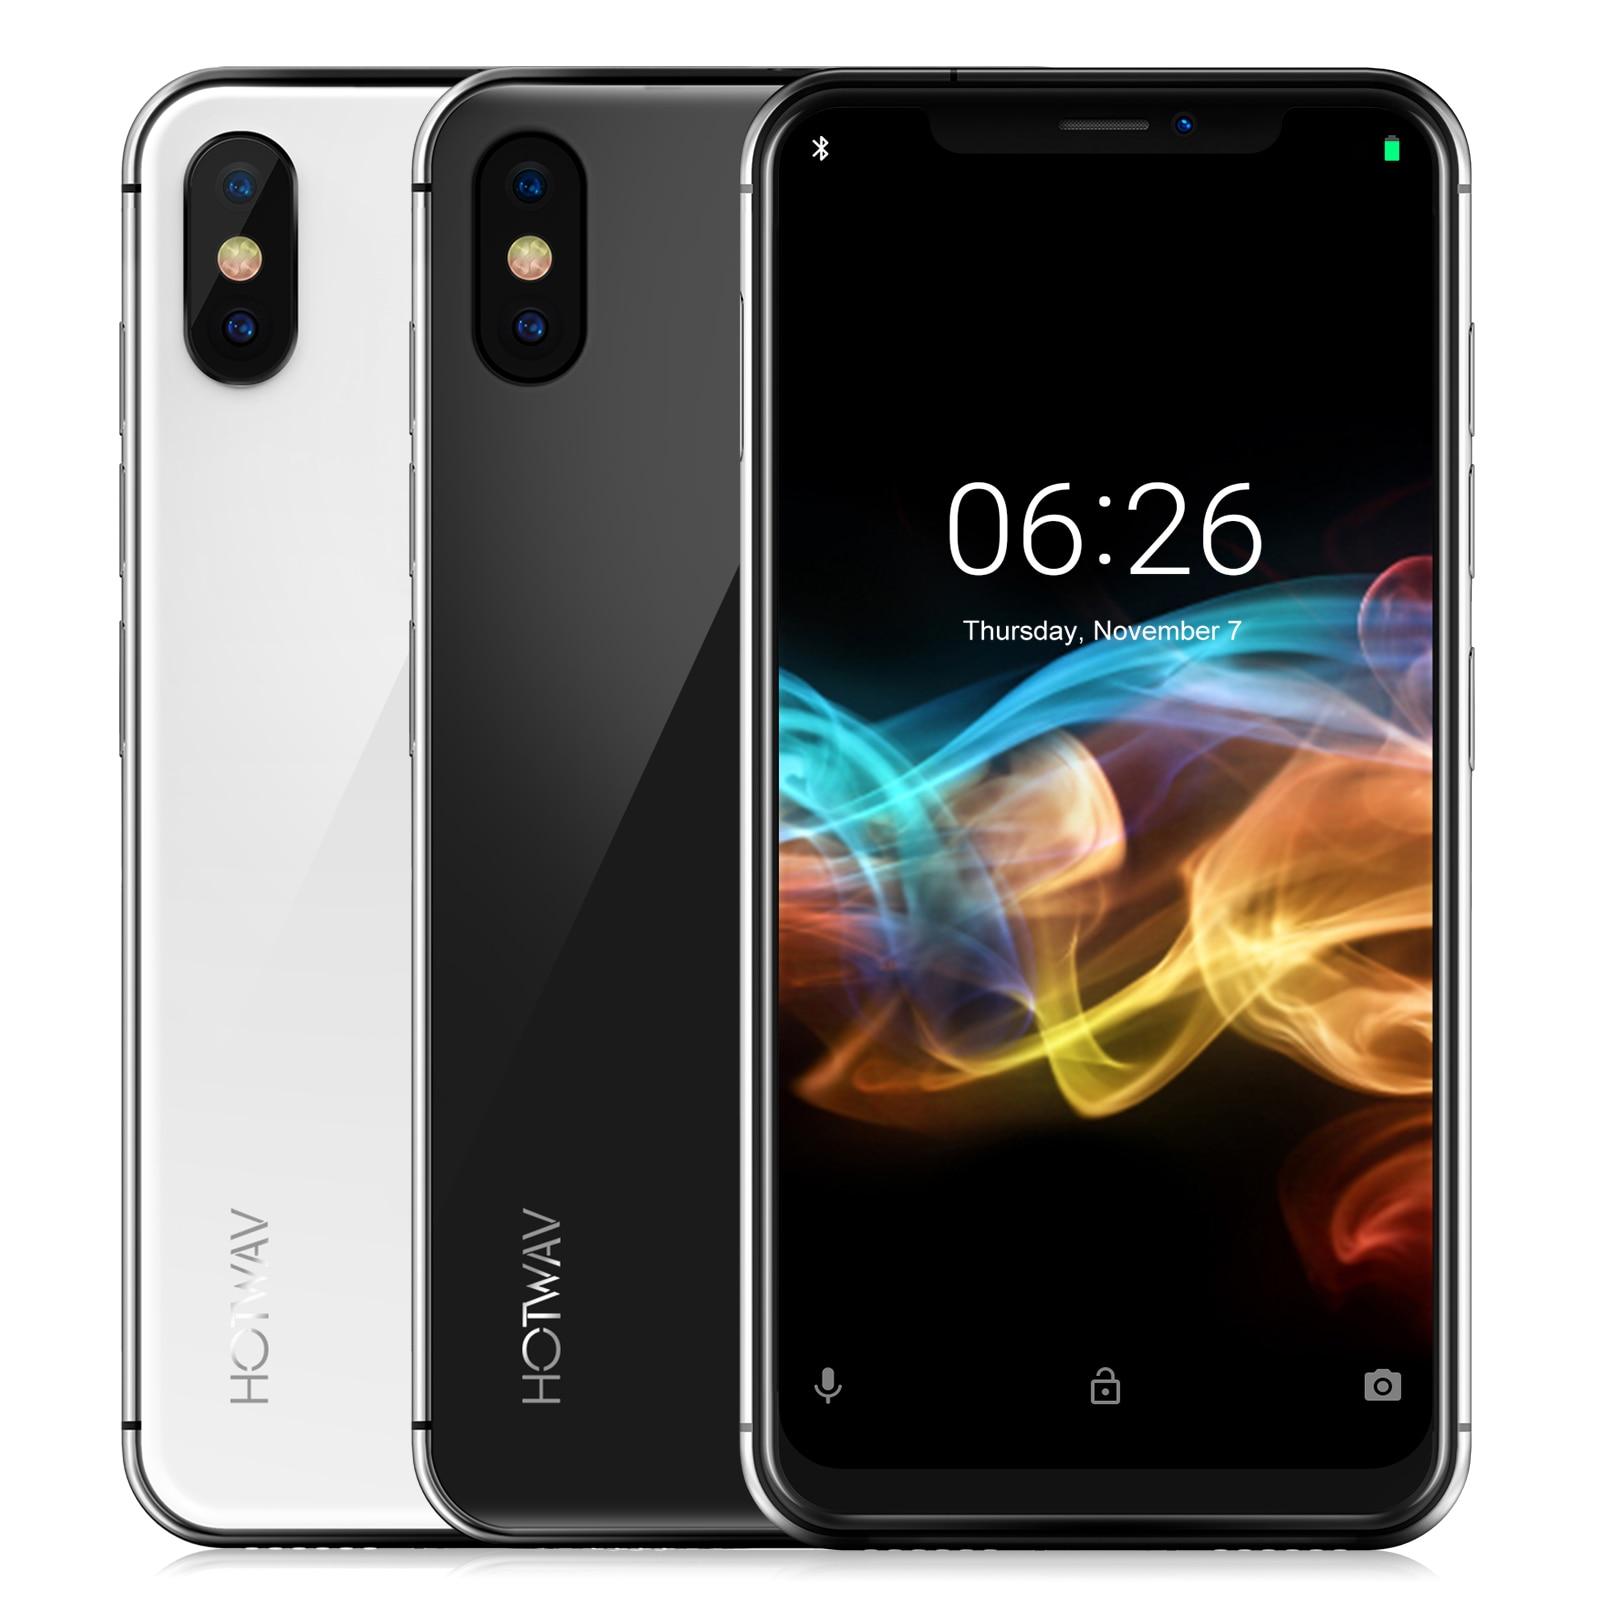 XGODY Face ID Android 8,1 Восьмиядерный 6,26 ''FHD + дисплей Мобильный телефон 16MP камера 3150 мАч 3 Гб RAM 32 Гб ROM 4G Celular смартфон